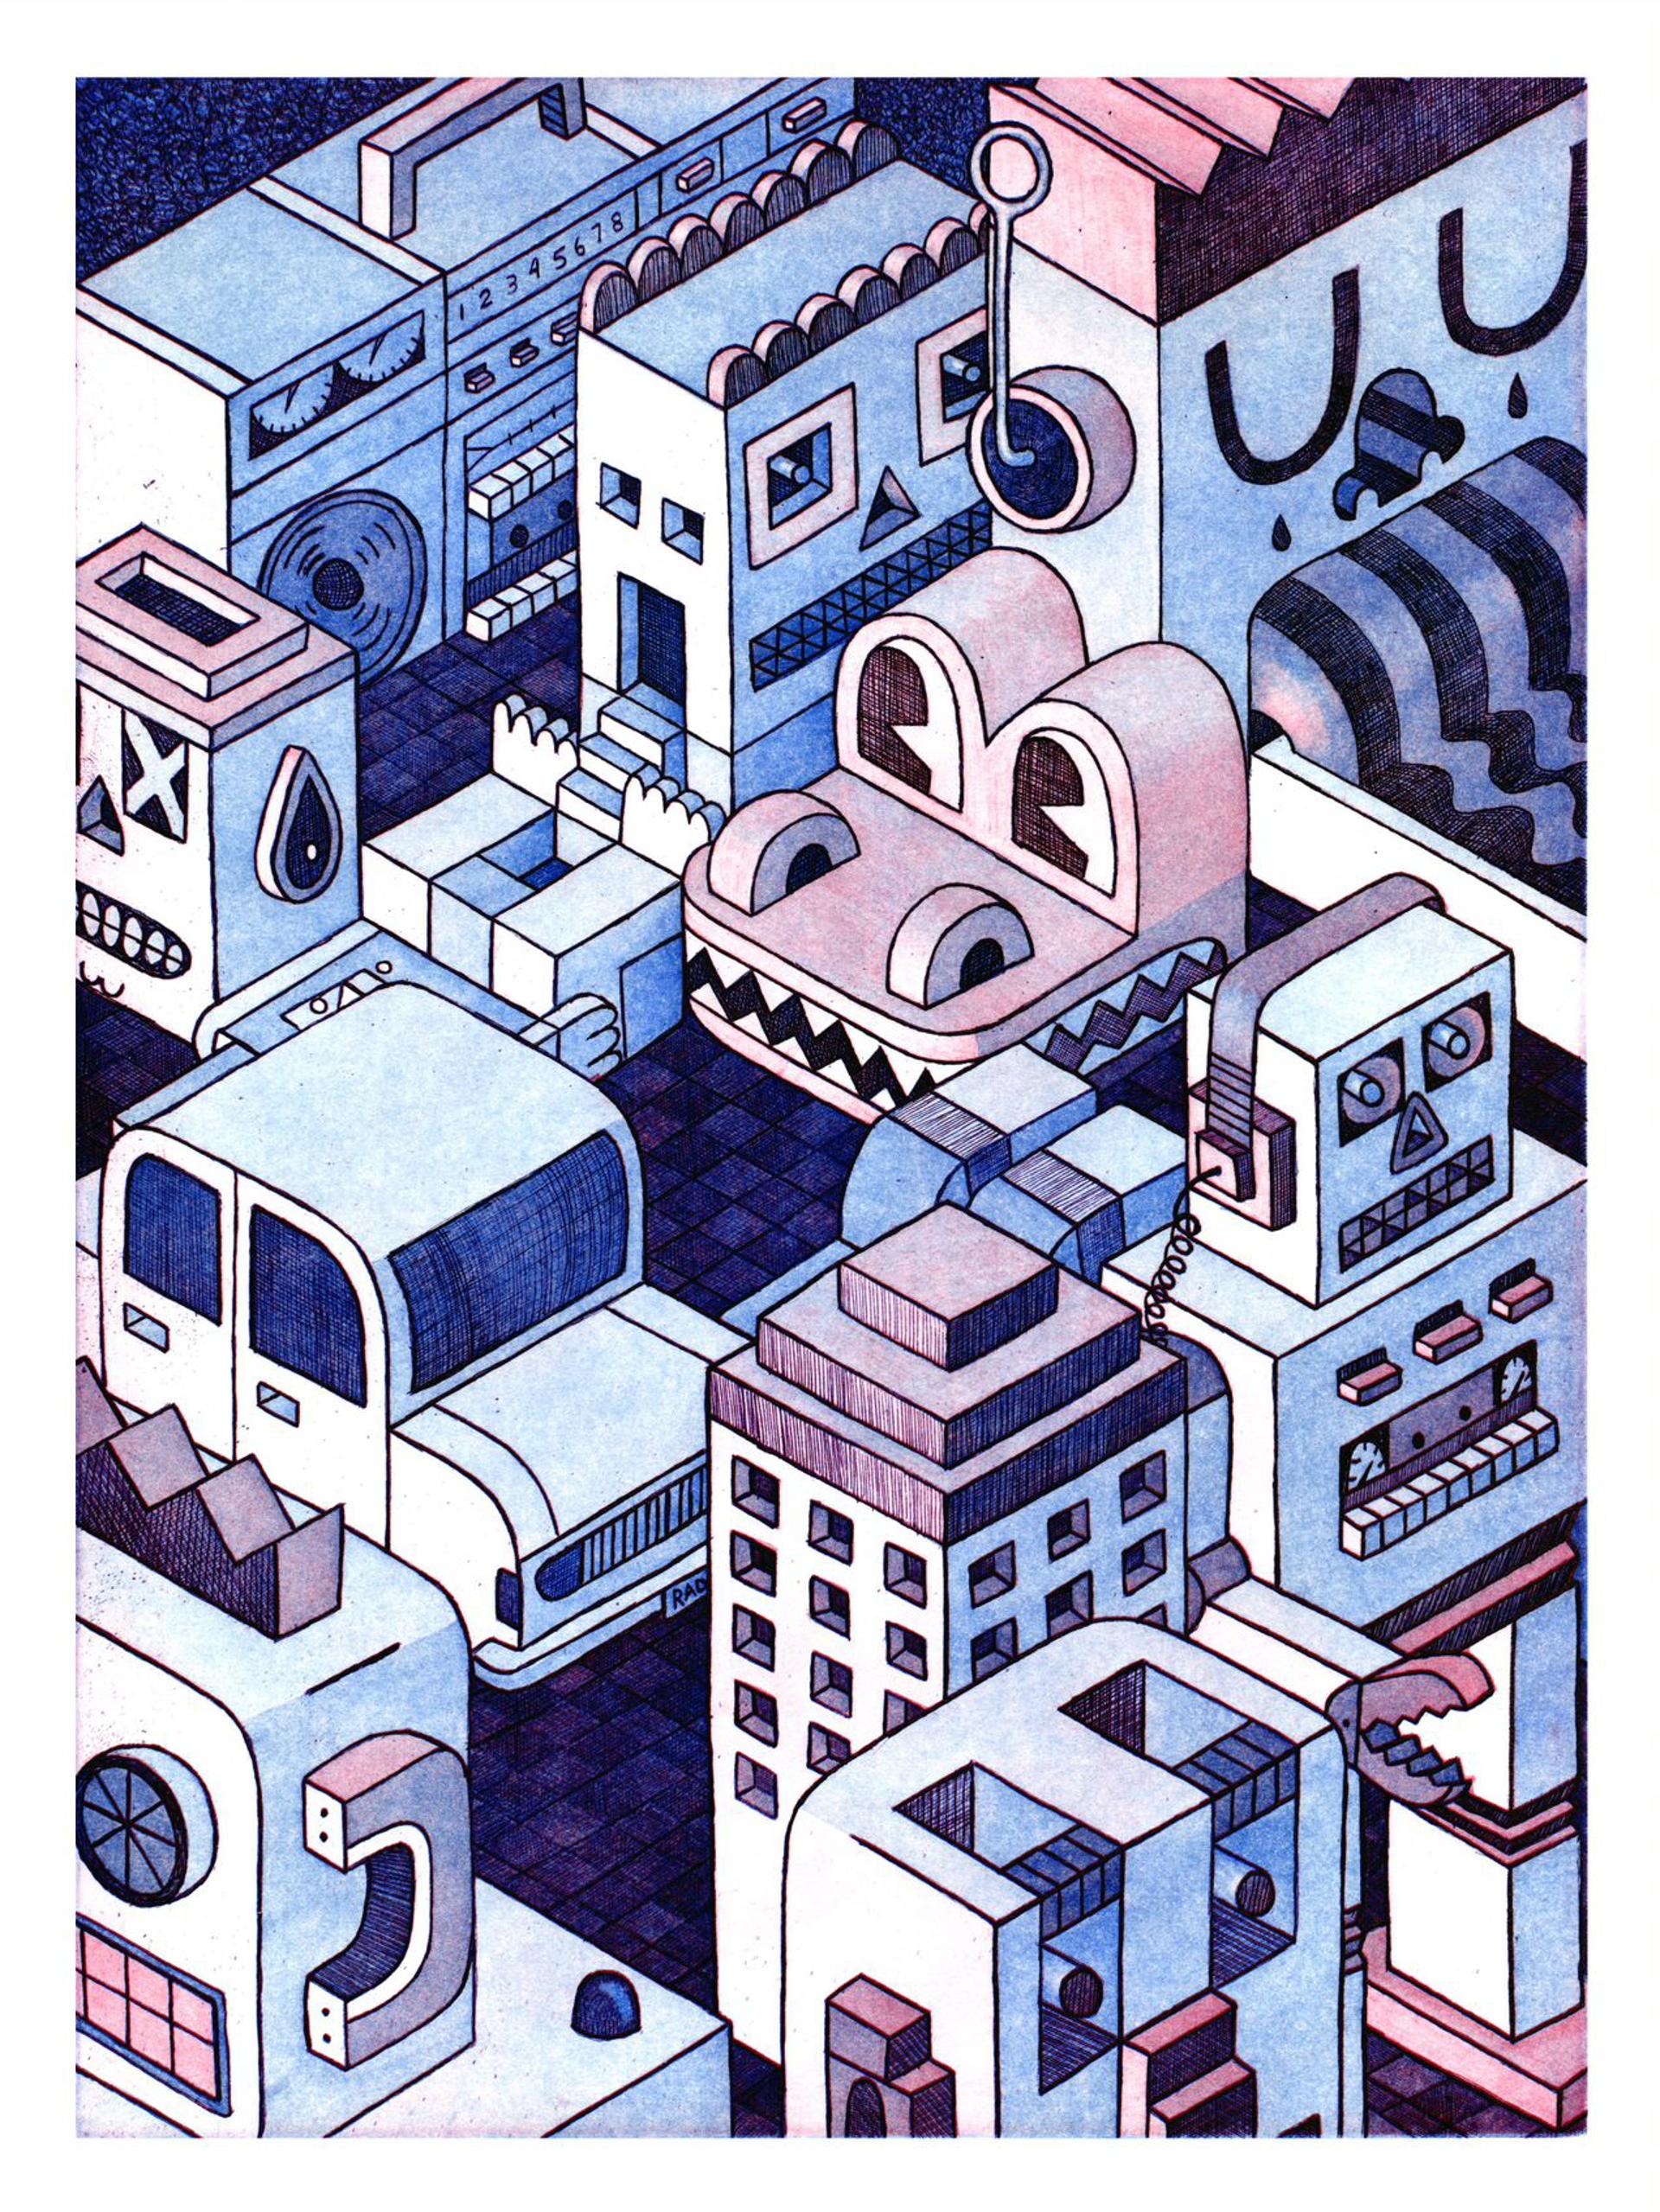 Domestic Sprawl by Chadwick Tolley